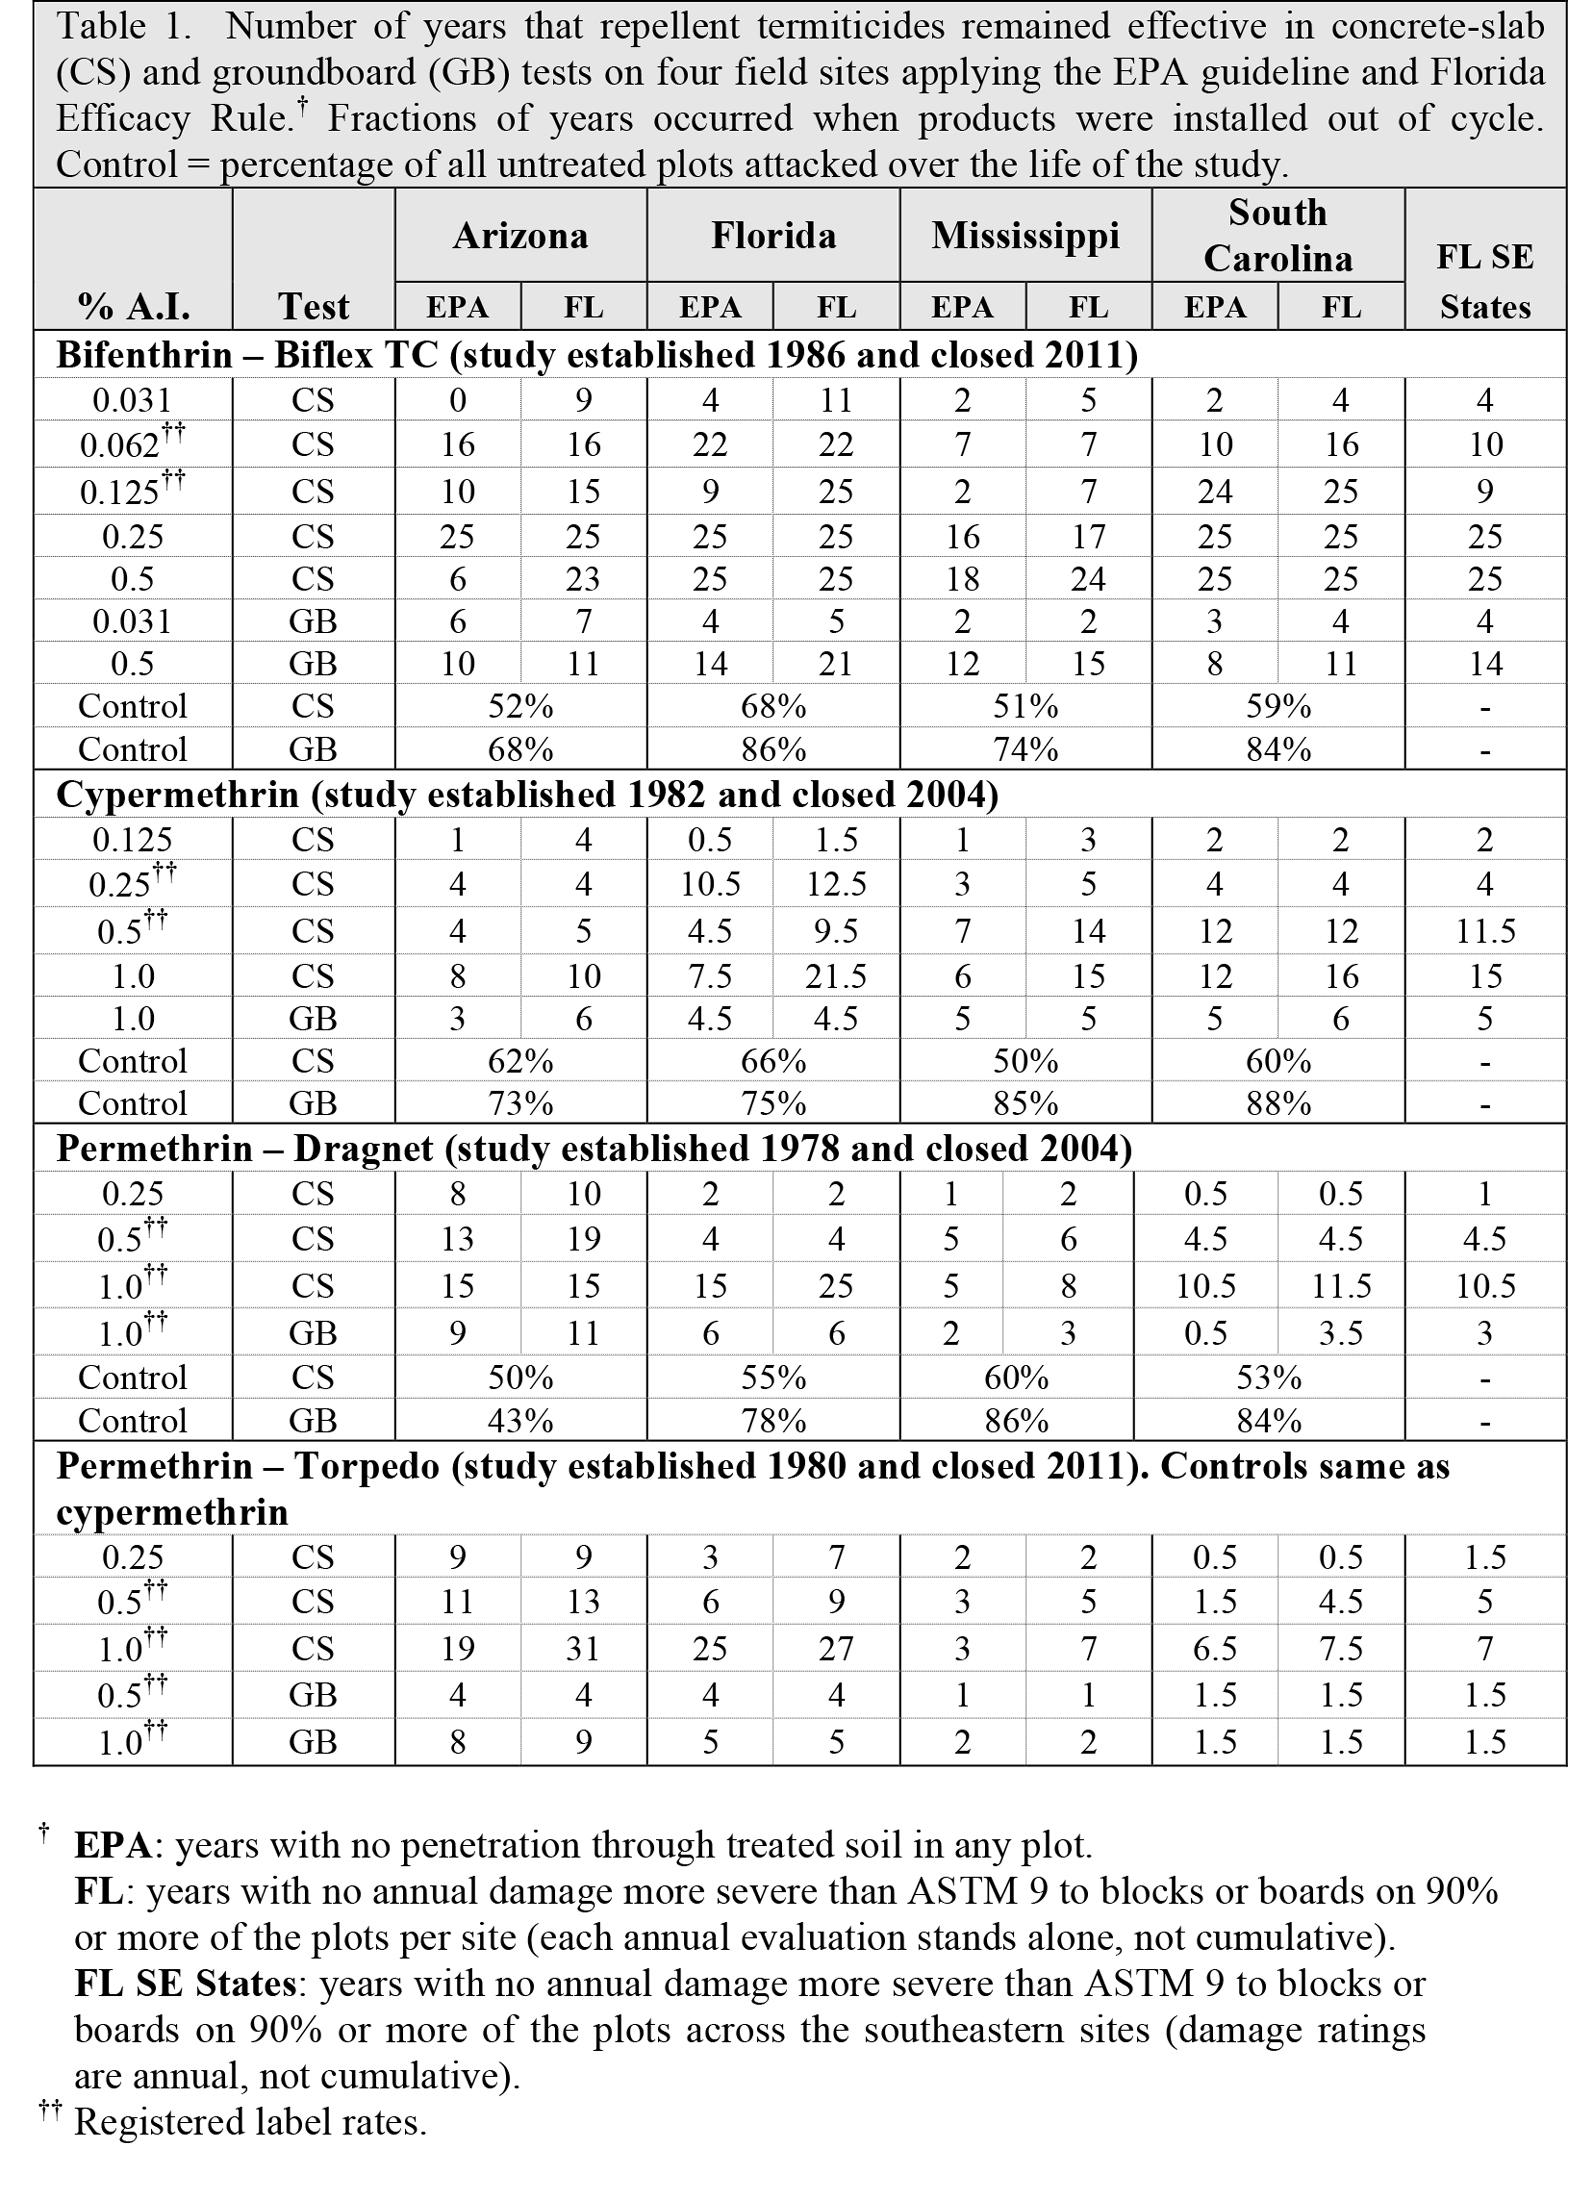 Table 1-USDA2016